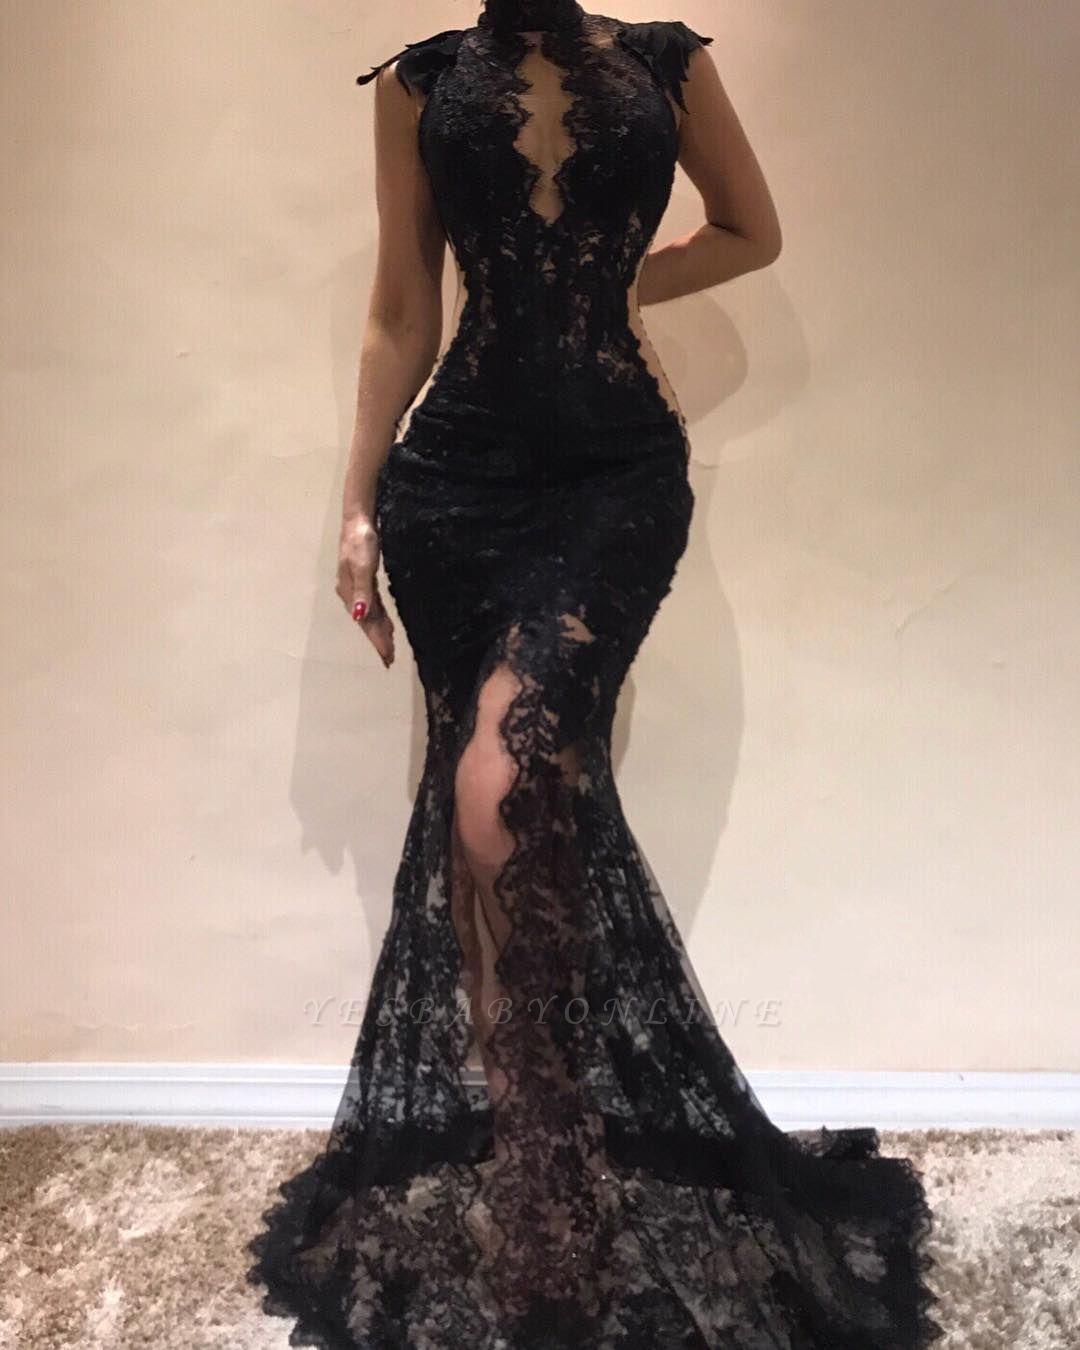 Sexy Black Lace Mermaid Evening Dresses | High Keyhole Neck Sheer Slit Prom DressesBC0513